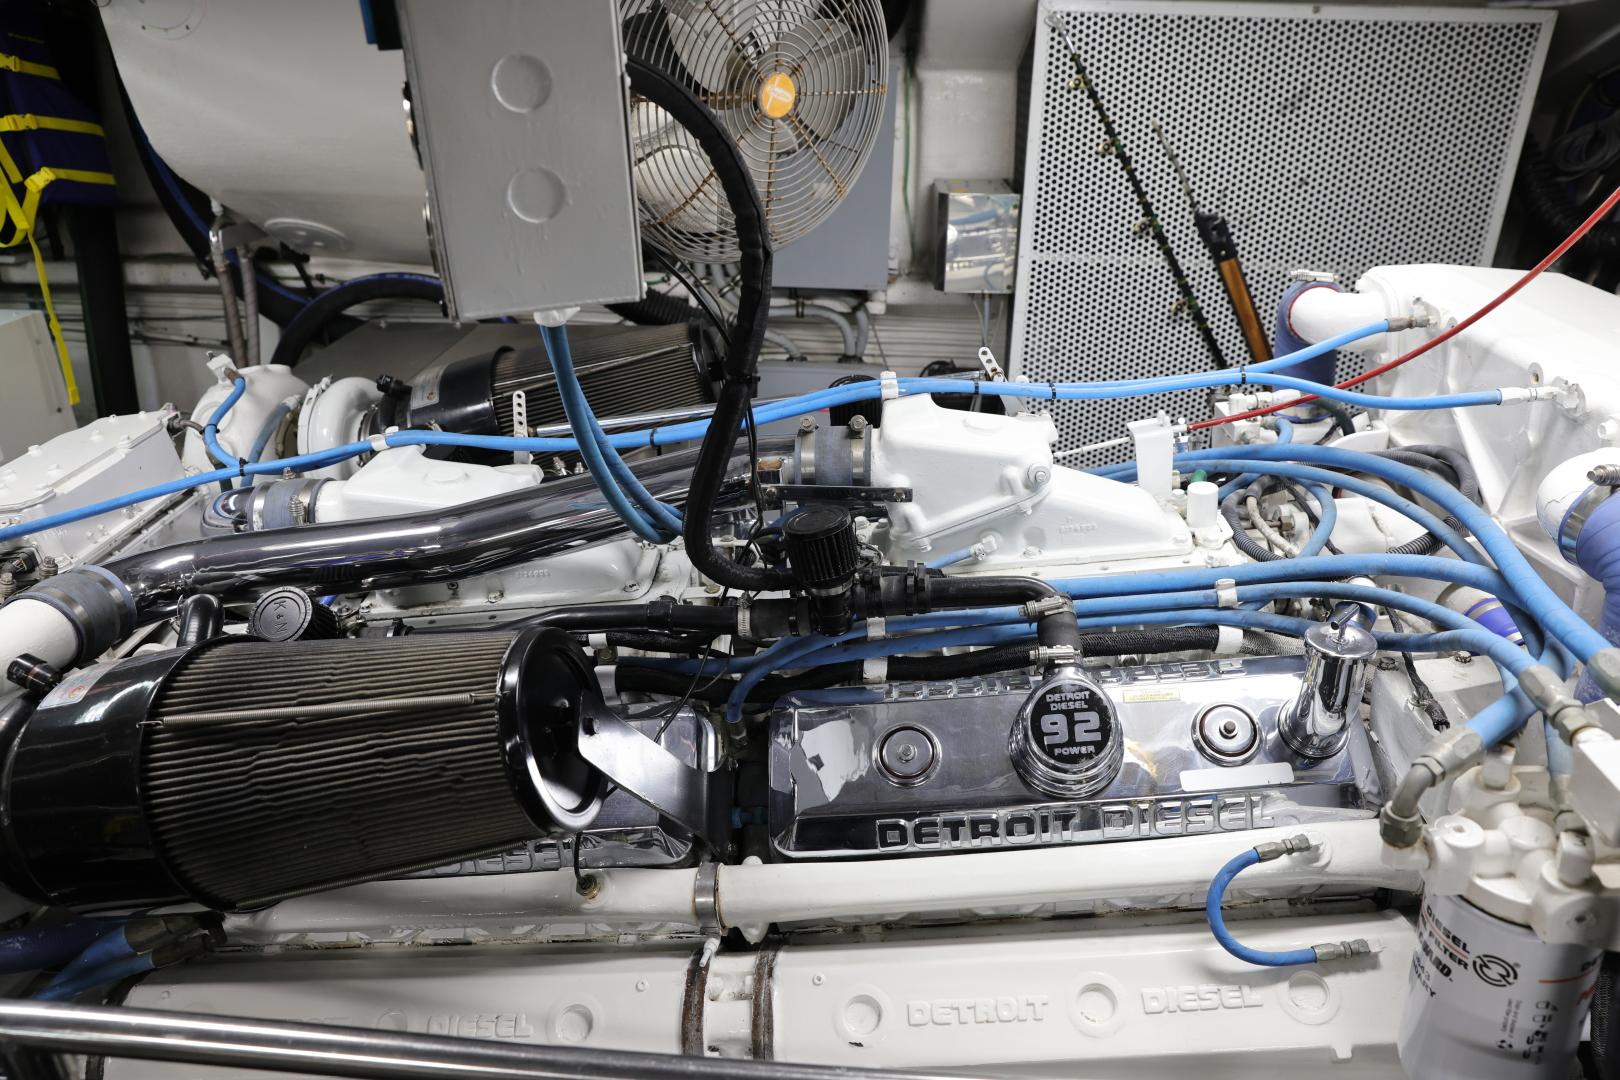 Hatteras-Convertible 1995-LADY LILA Newport Beach-California-United States-ENGINE ROOM-1516280 | Thumbnail